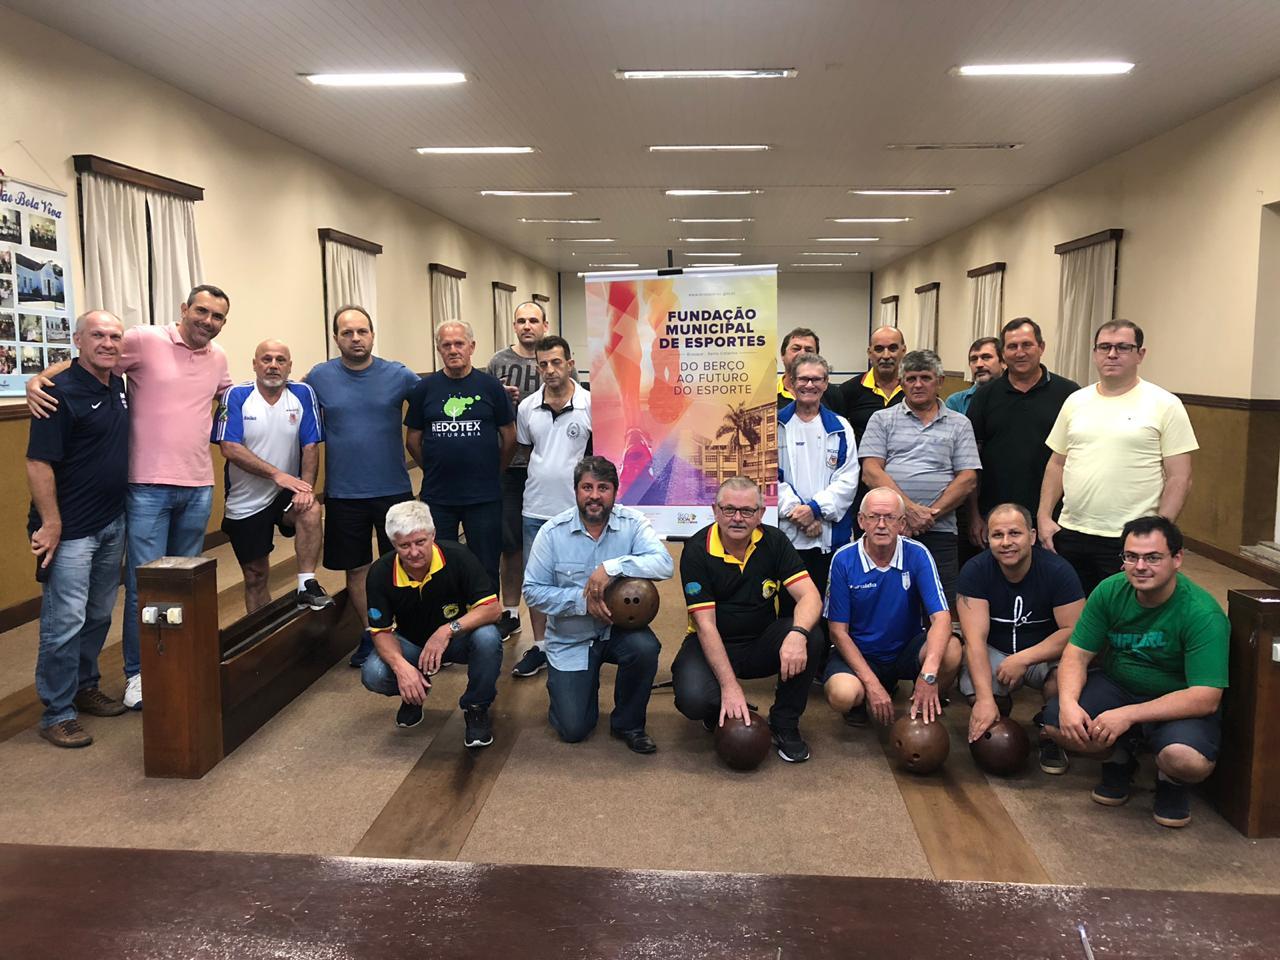 Prefeitura promove Campeonato Municipal de Bolão 23 Masculino